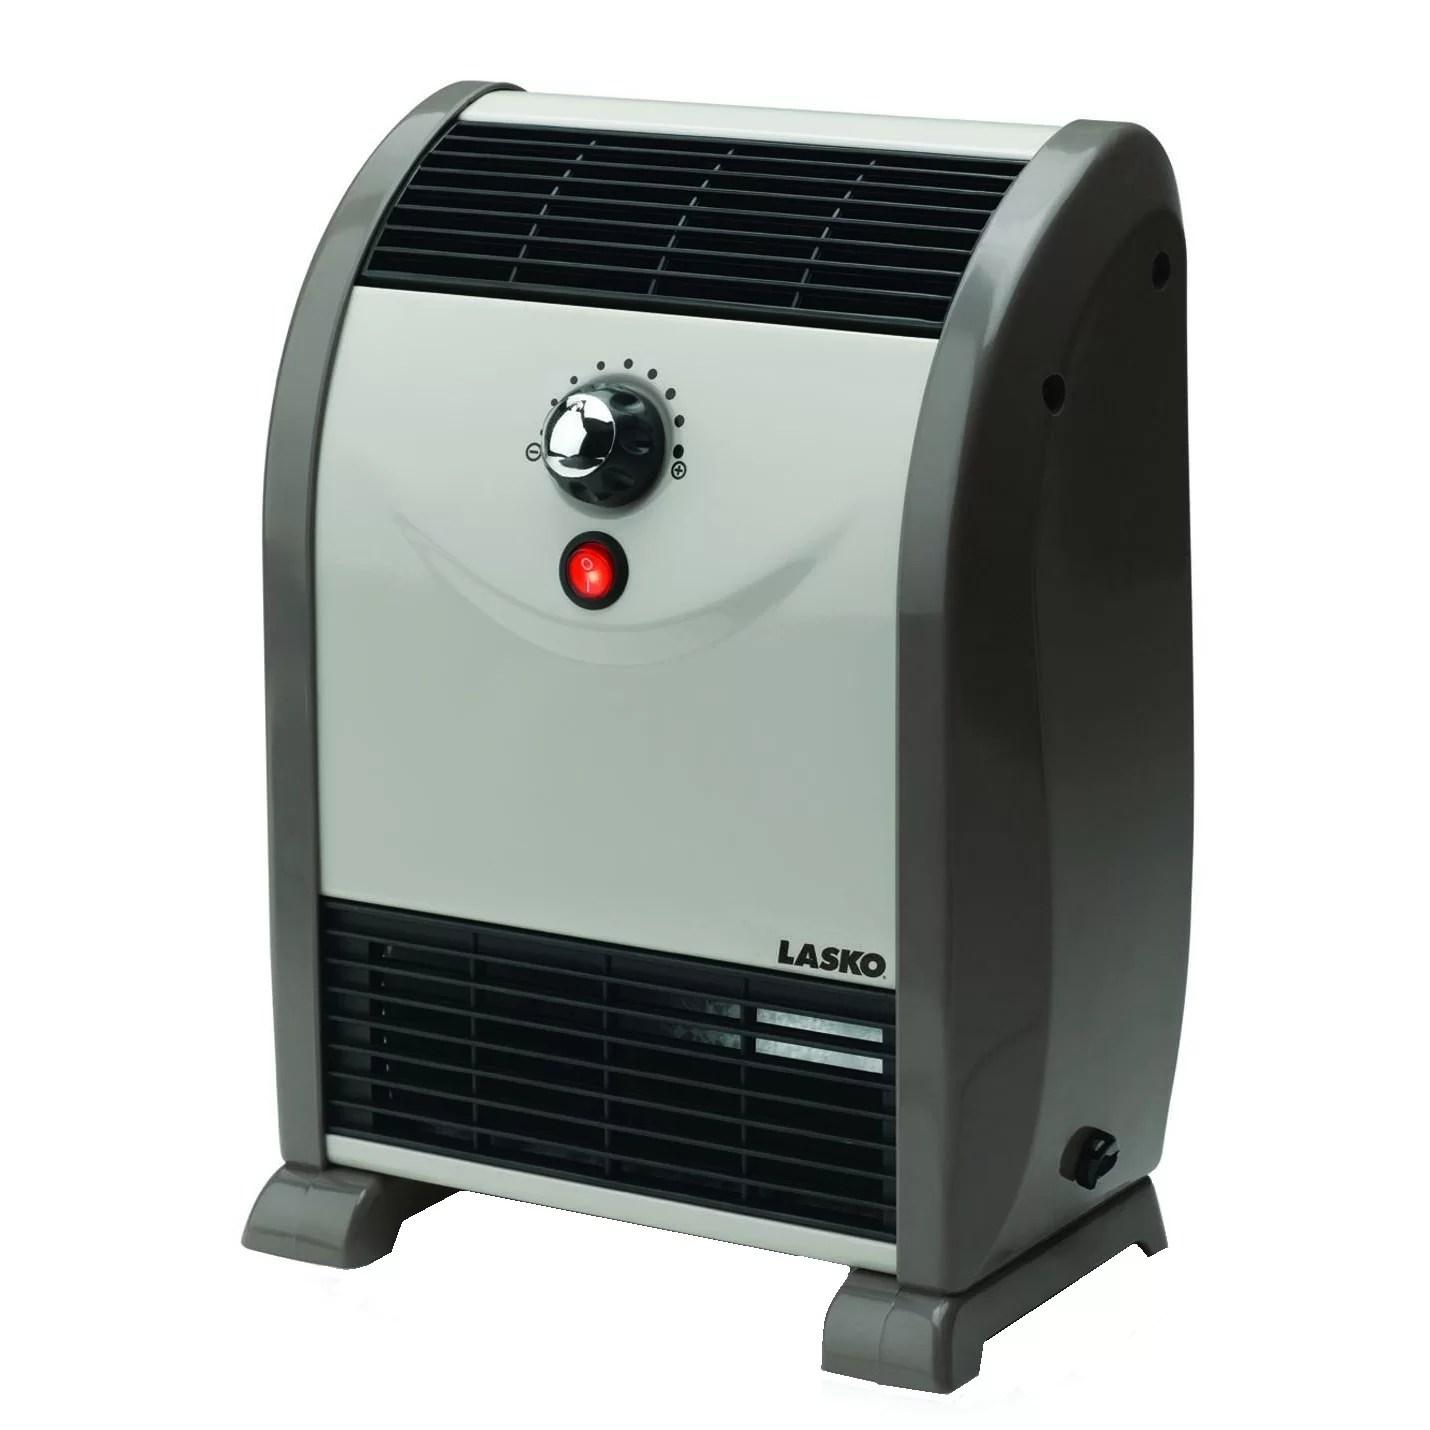 electric fan heaters ford escape fuse box diagram lasko 1 500 watt portable compact heater with